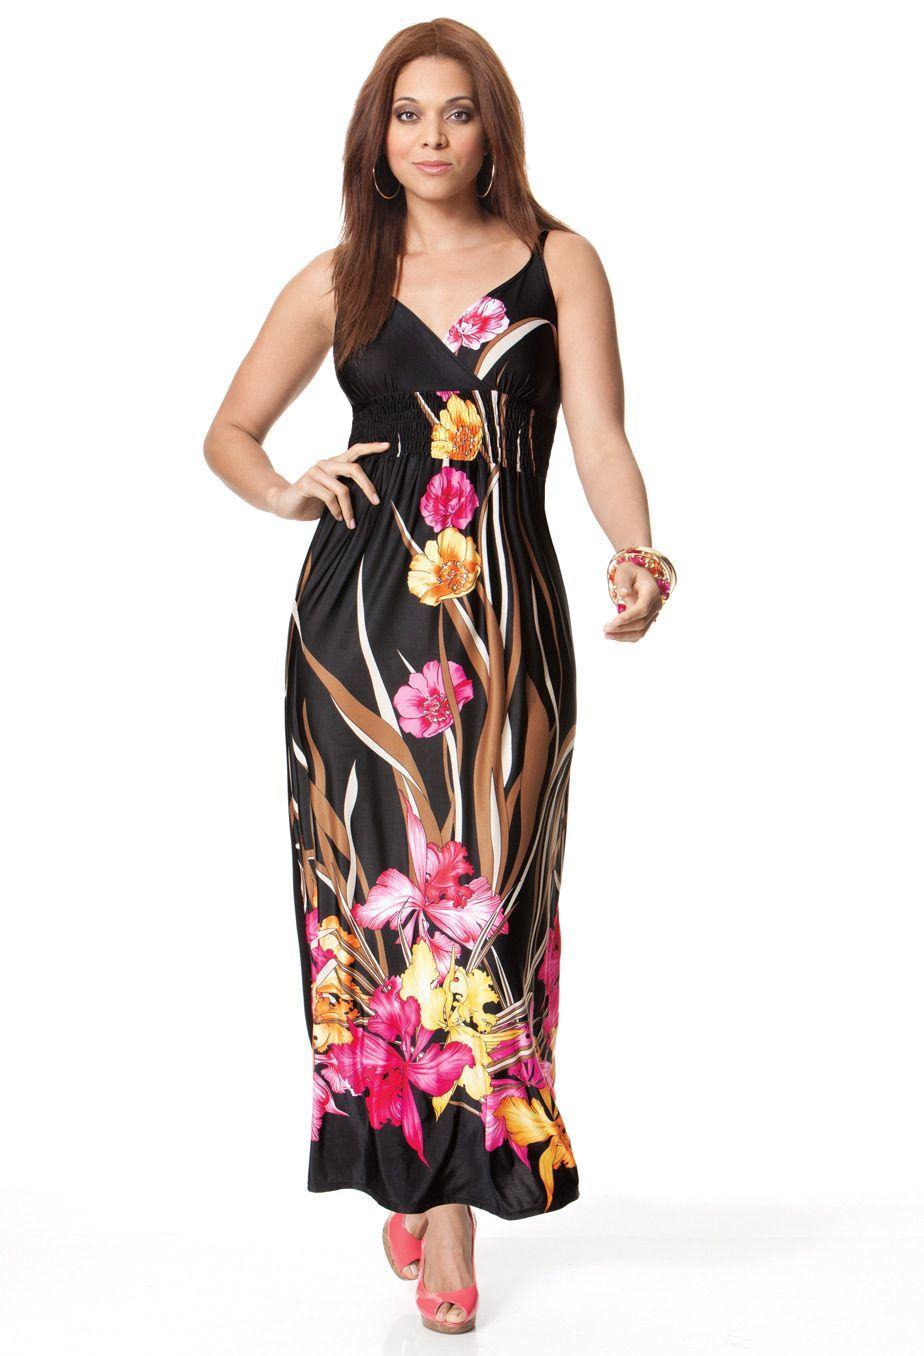 Avenue ~Women's Plus Size Smocked Maxi Dress Item #: 0305-02445-1345